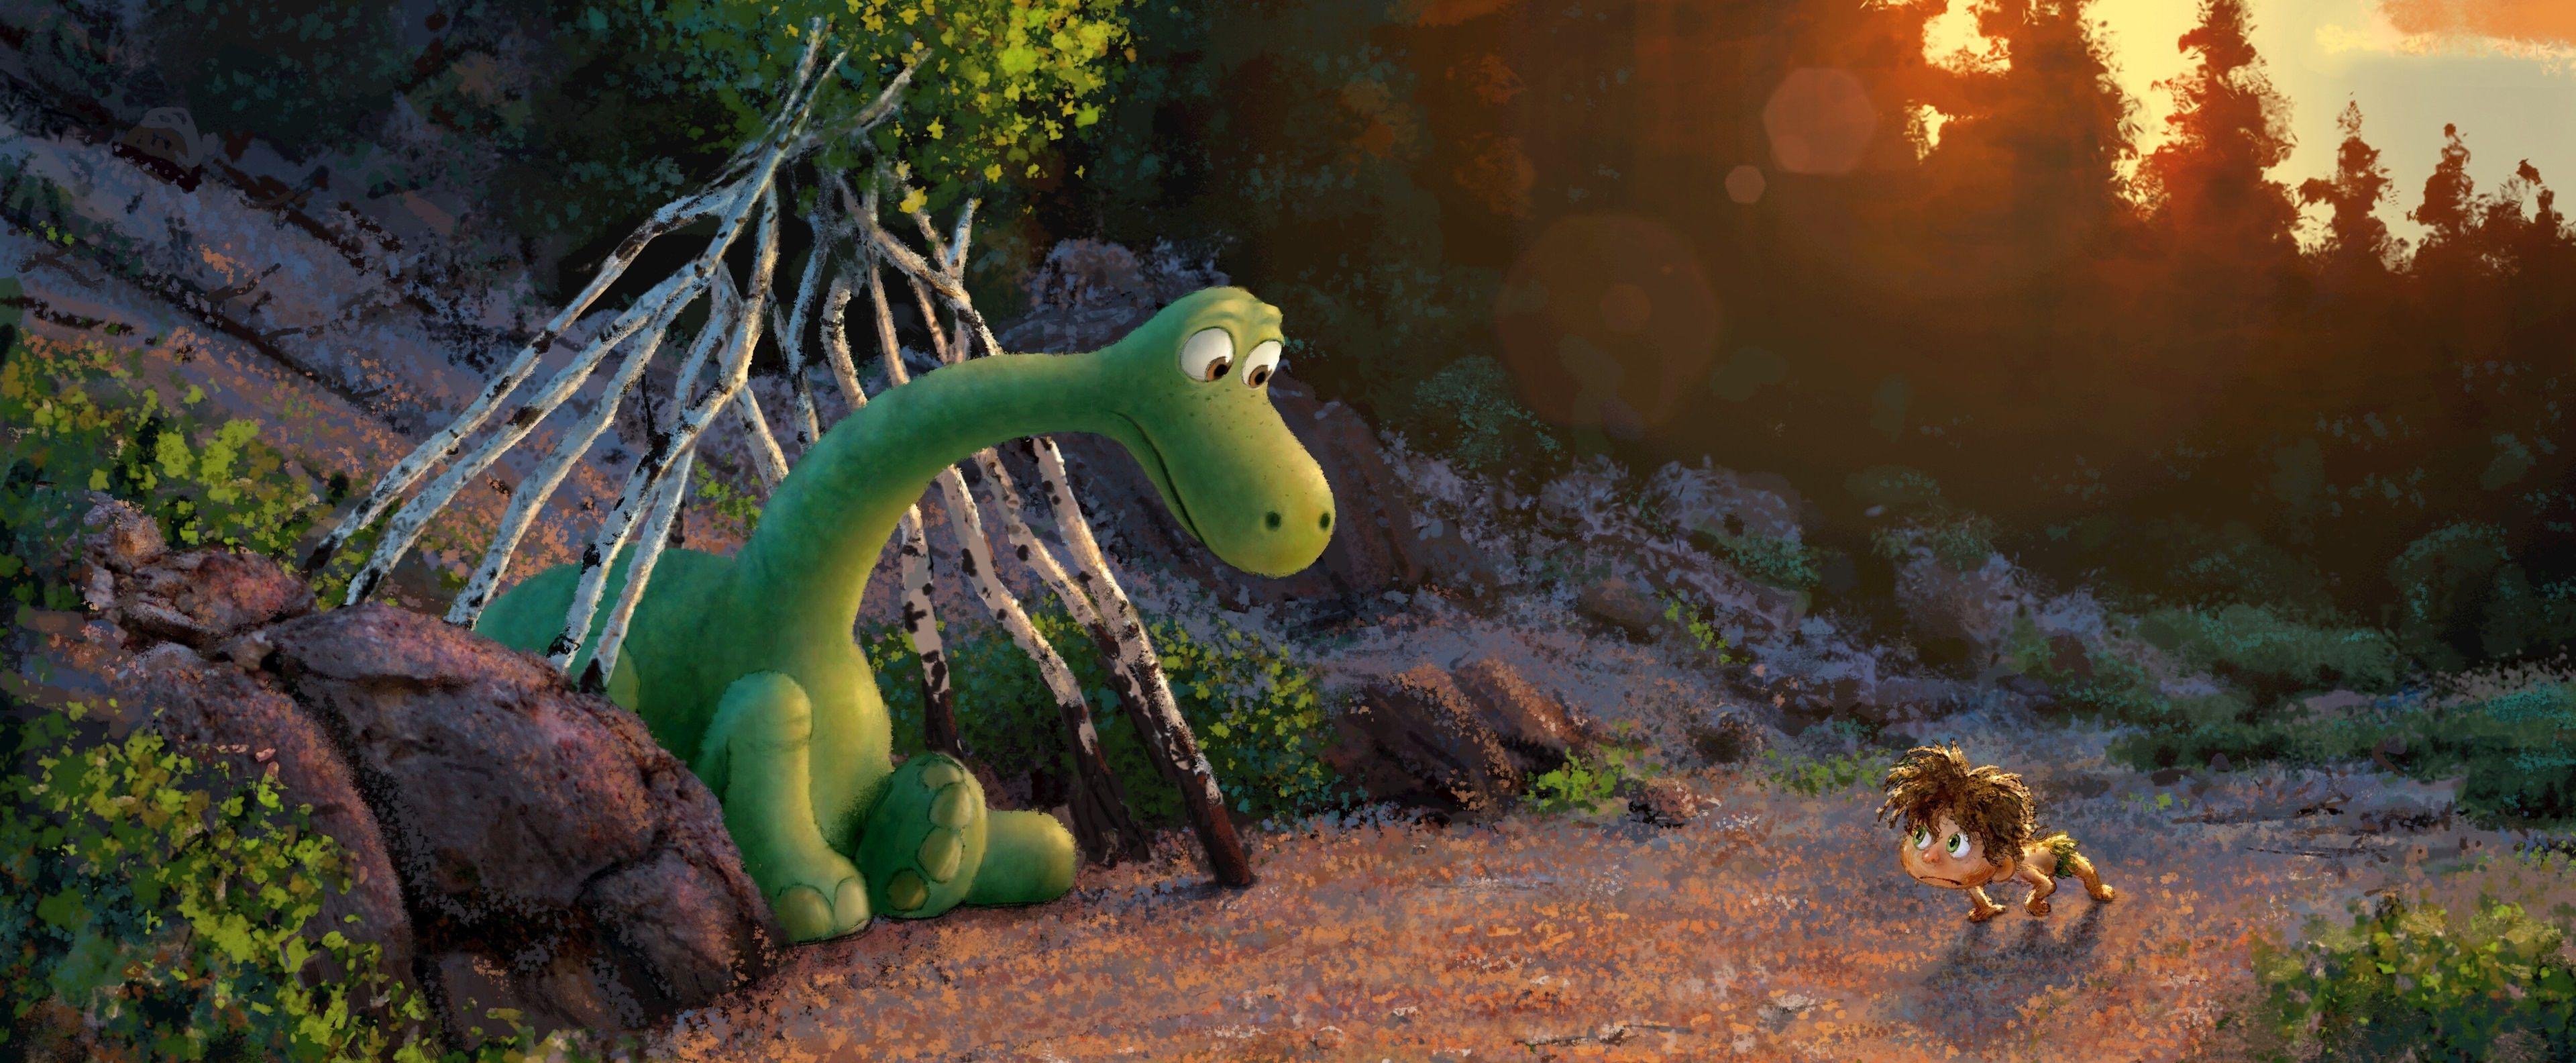 3840x1584 the good dinosaur 4k wallpaper hd pc download